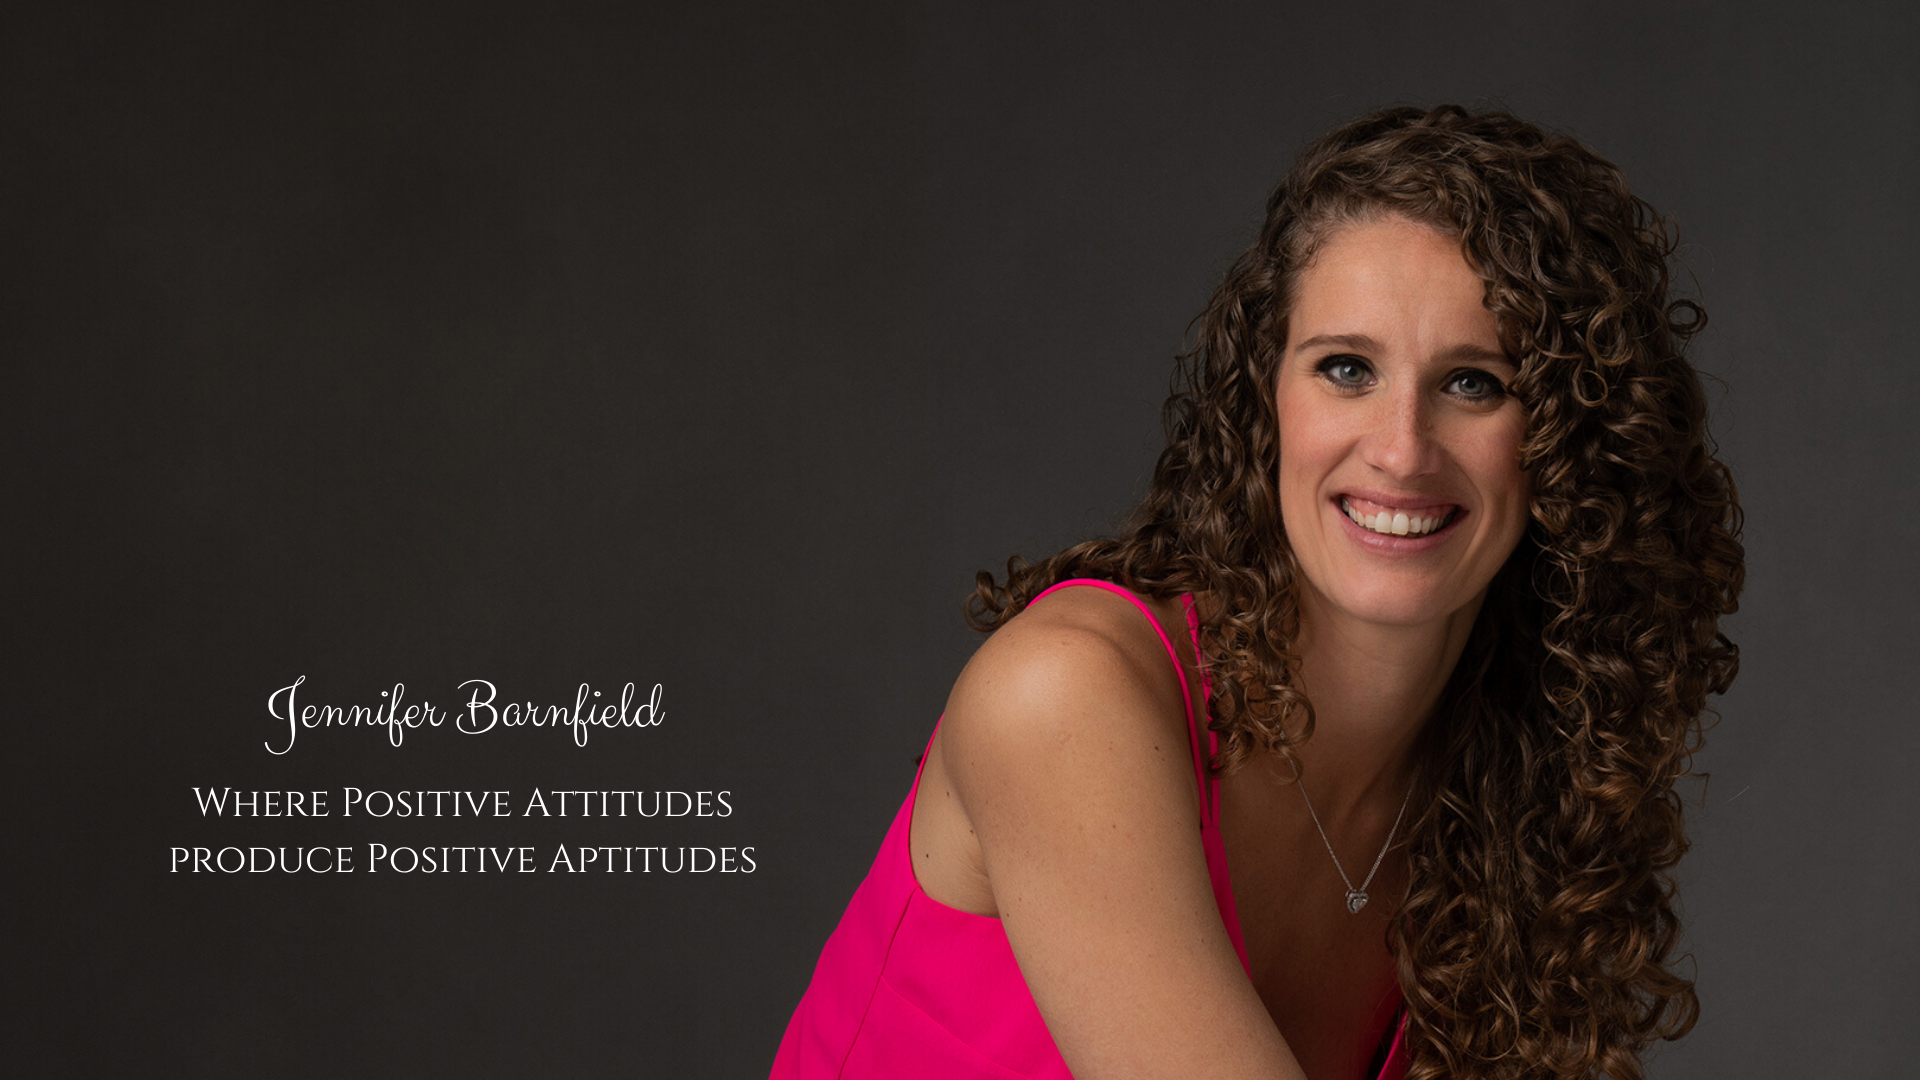 Jennifer Barnfield - The PEPP Method